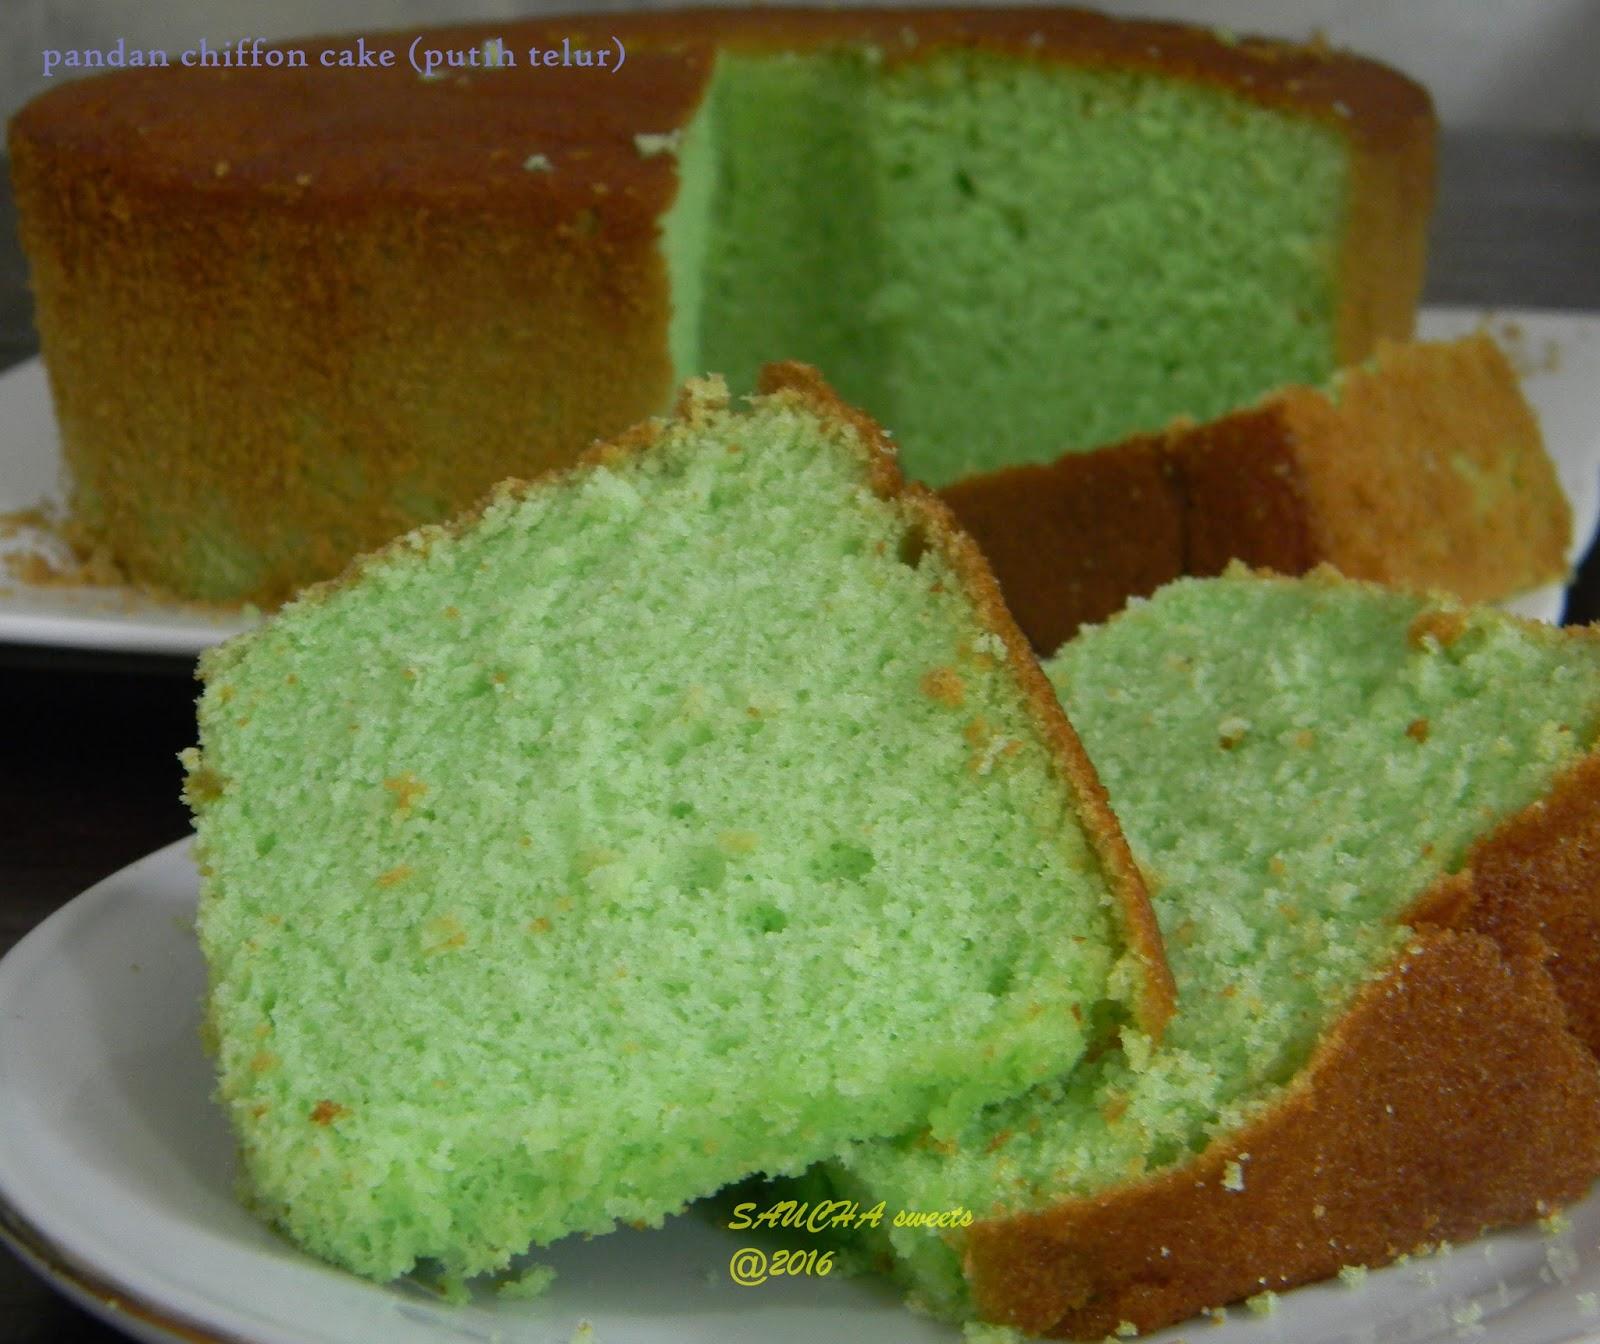 Pandan Chiffon Cake Putih Telur Dapur Saucha